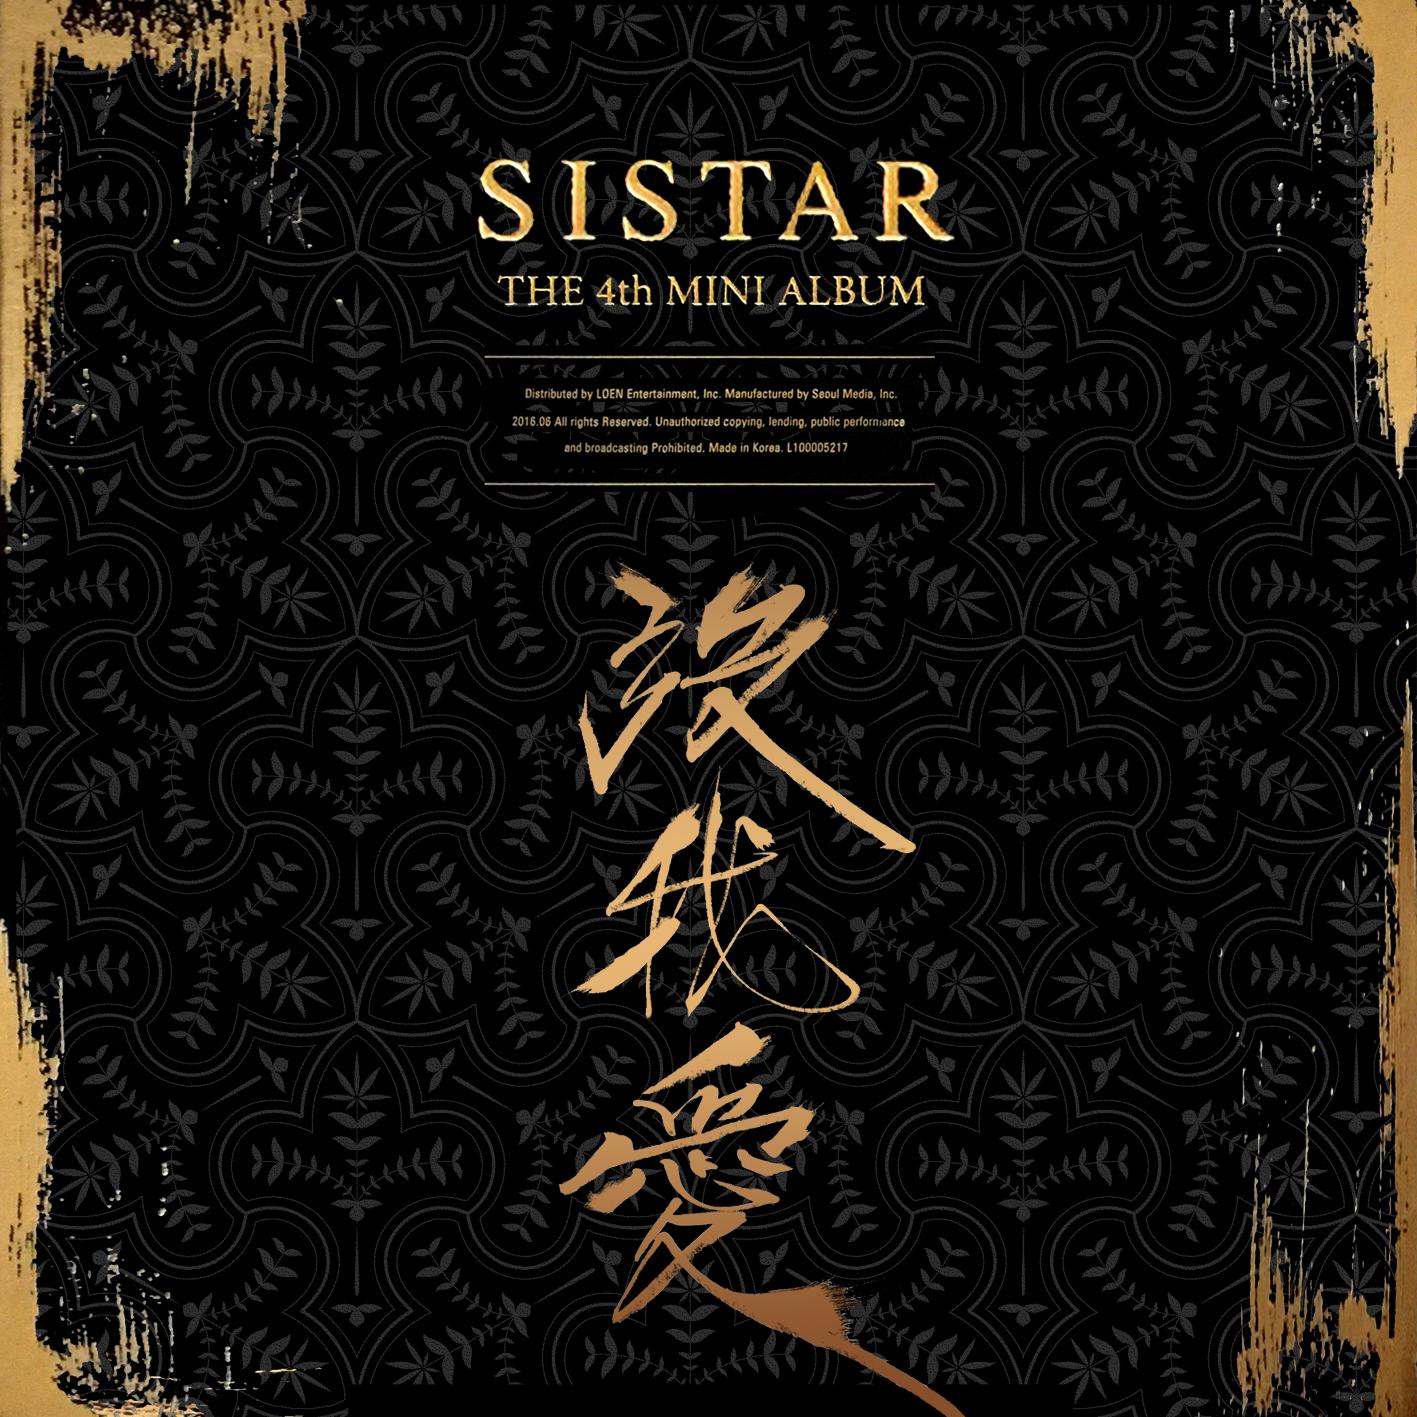 20160621.03.03 Sistar - Insane love cover.jpg